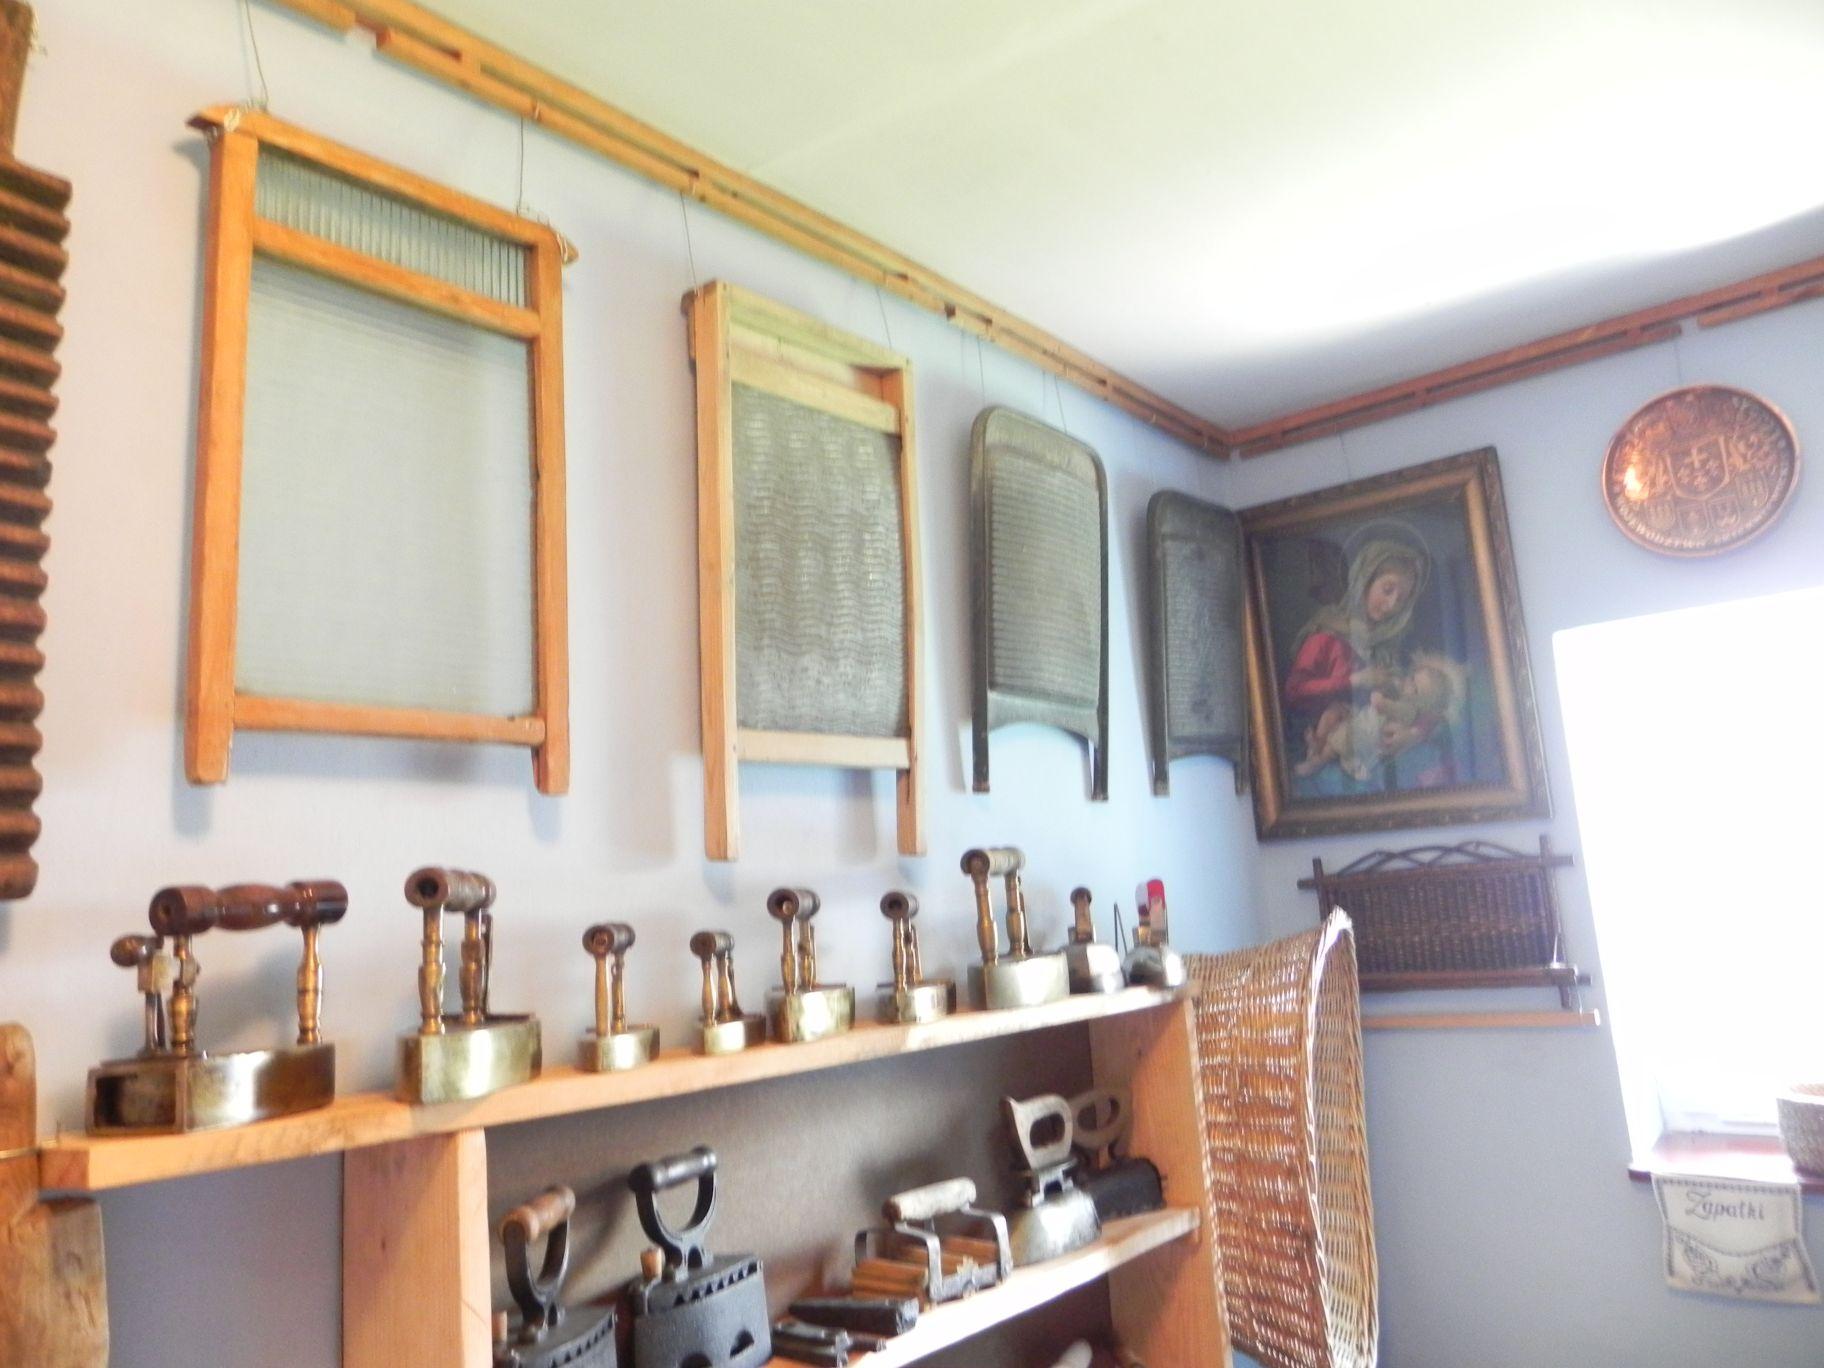 2012-05-03 Lipce Reymontowskie - galeria staroci (18)